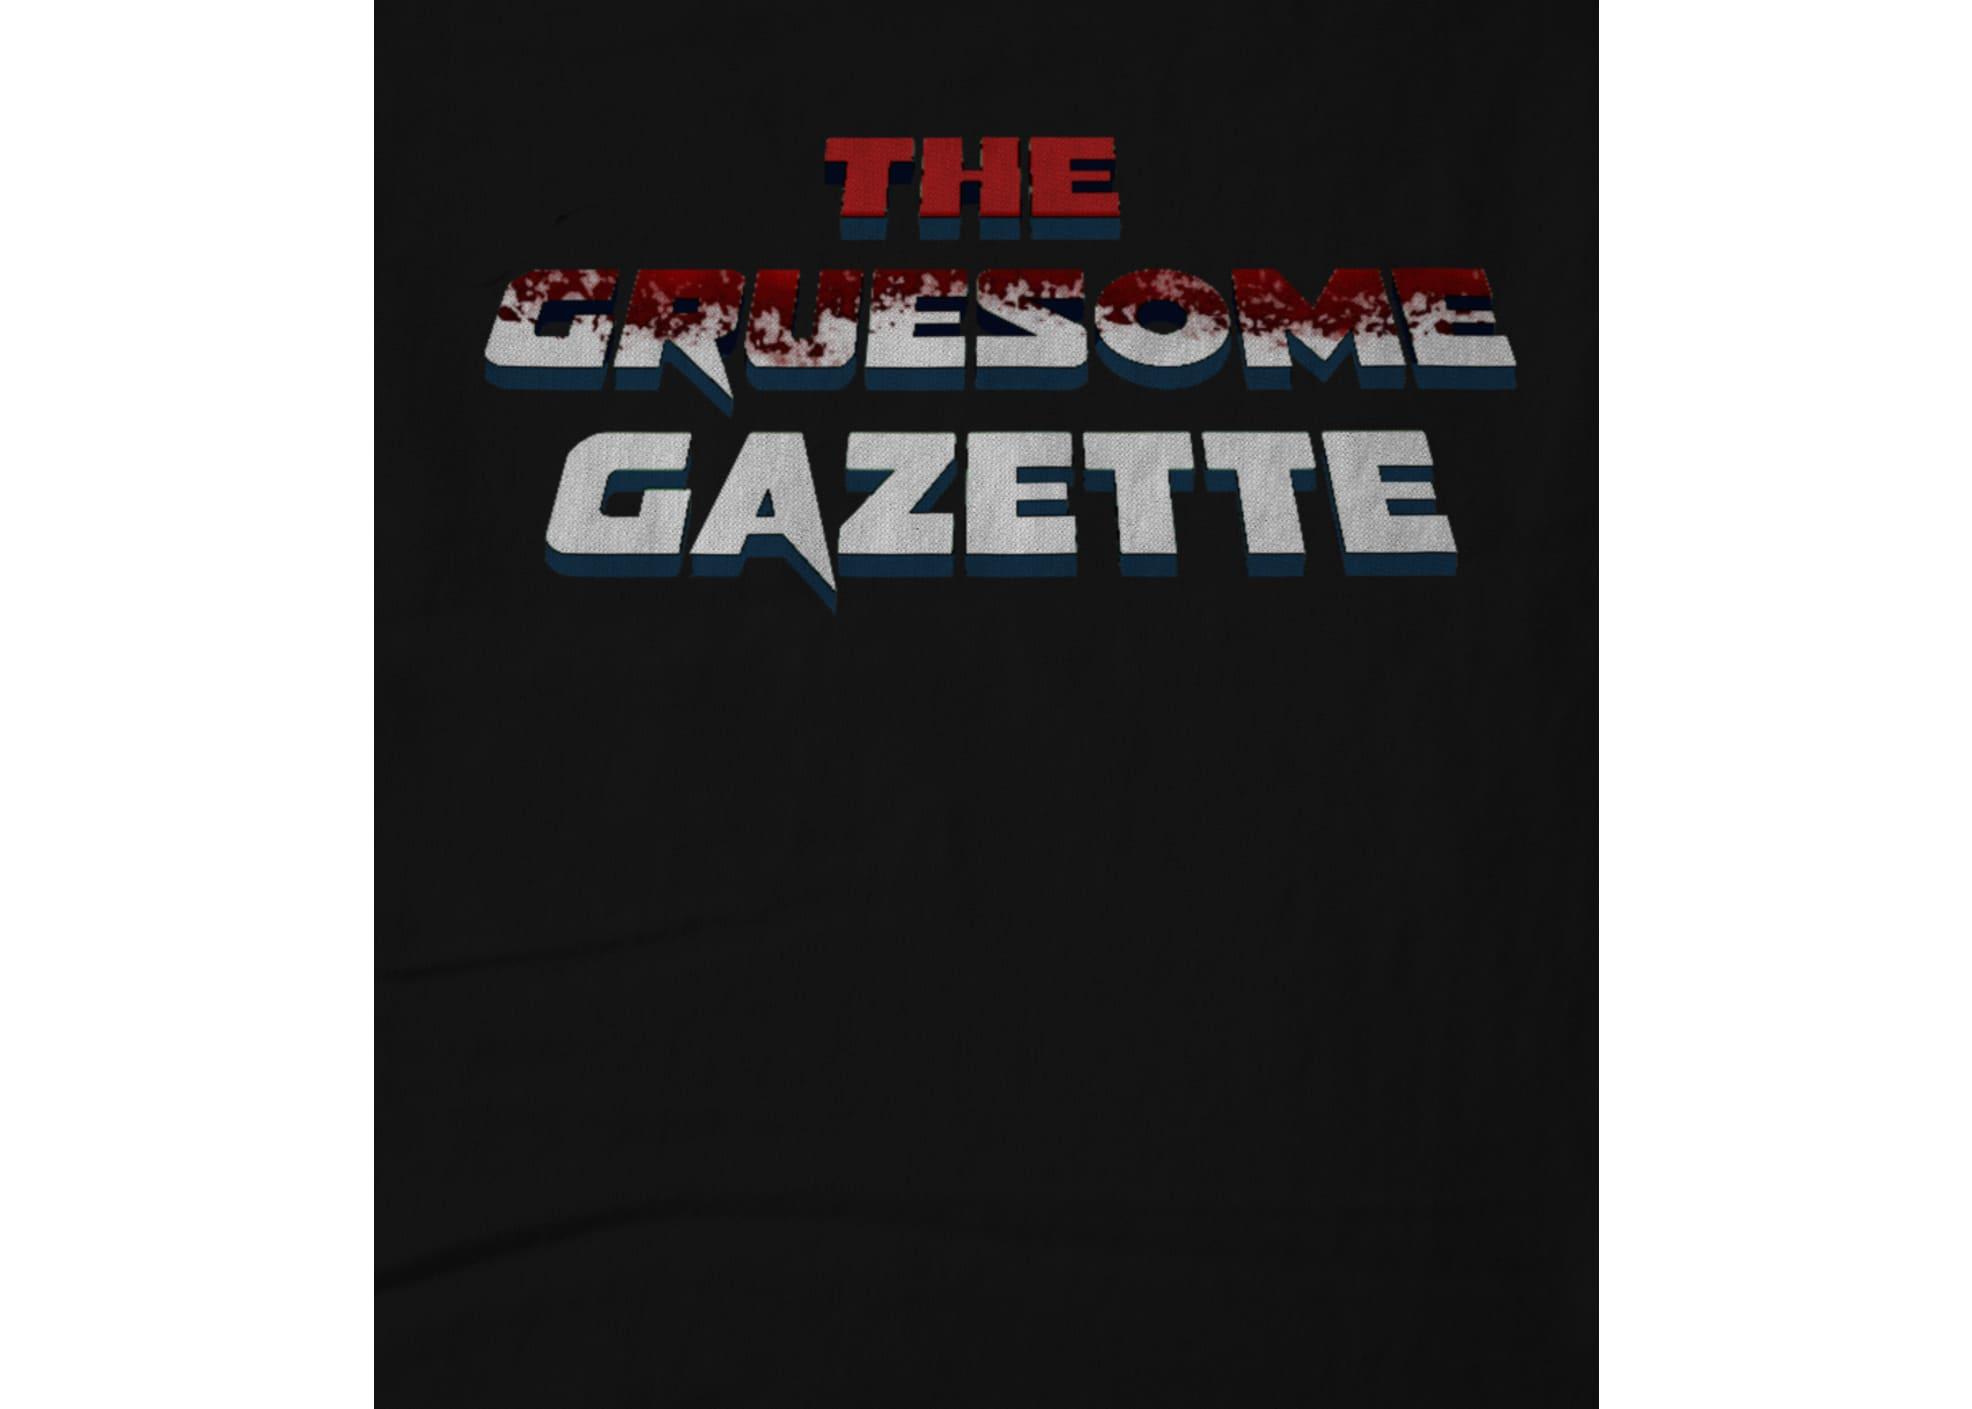 Gruesome gazette logo 1602636248